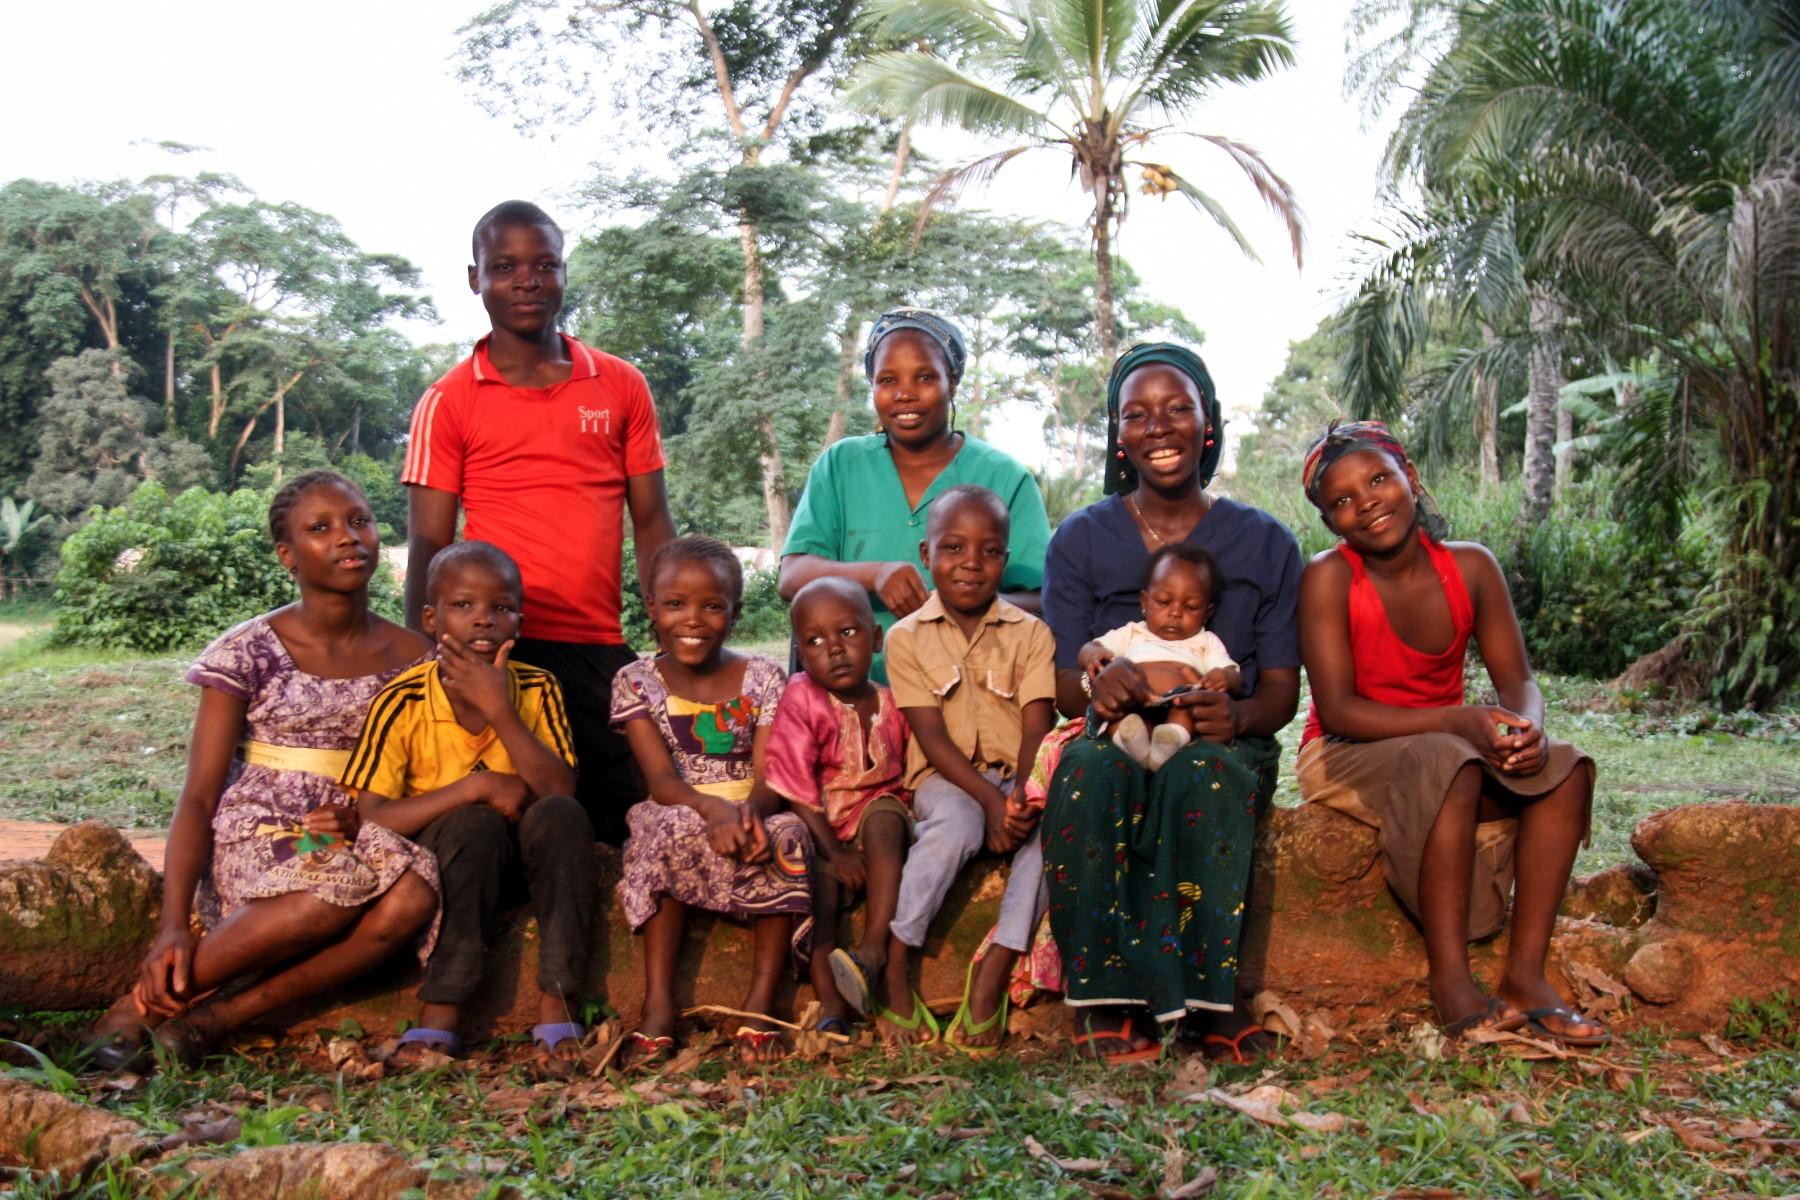 refugiadas del norte de camerun